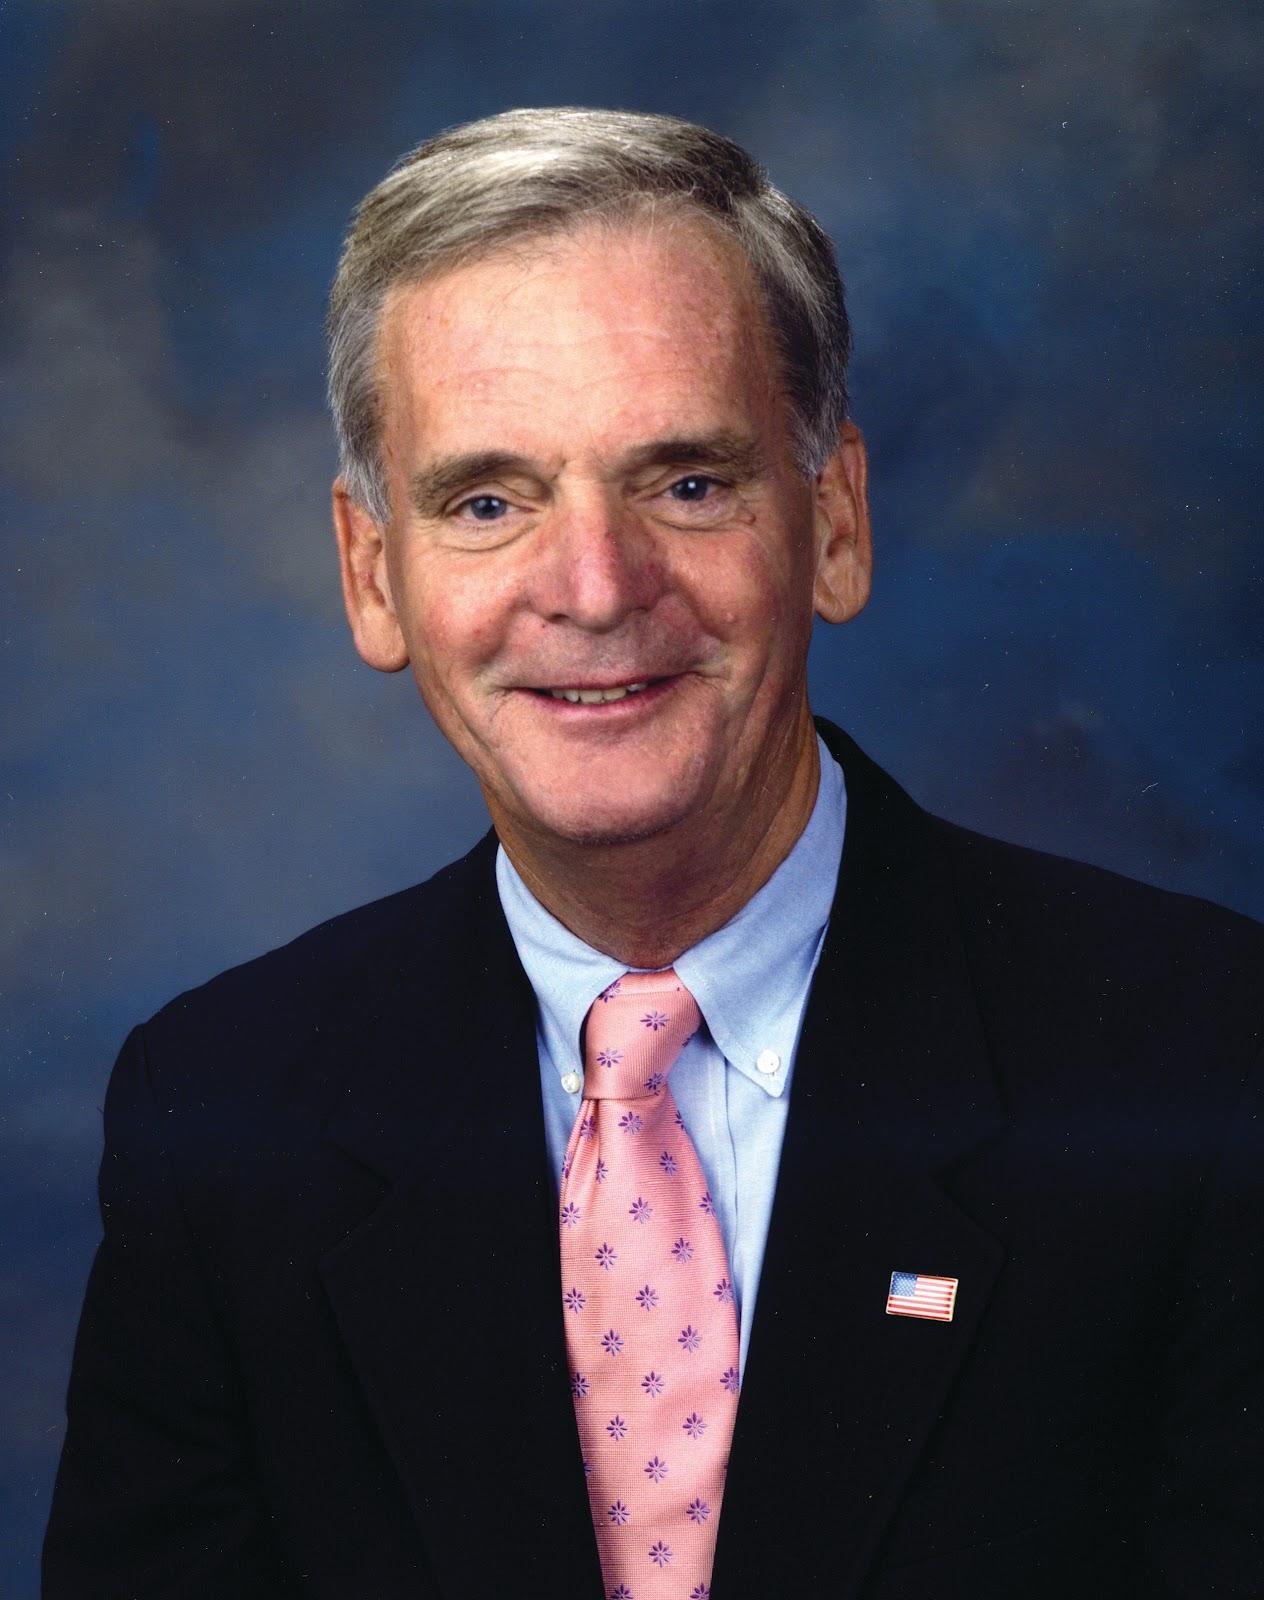 Senator Judd Gregg - Headshot